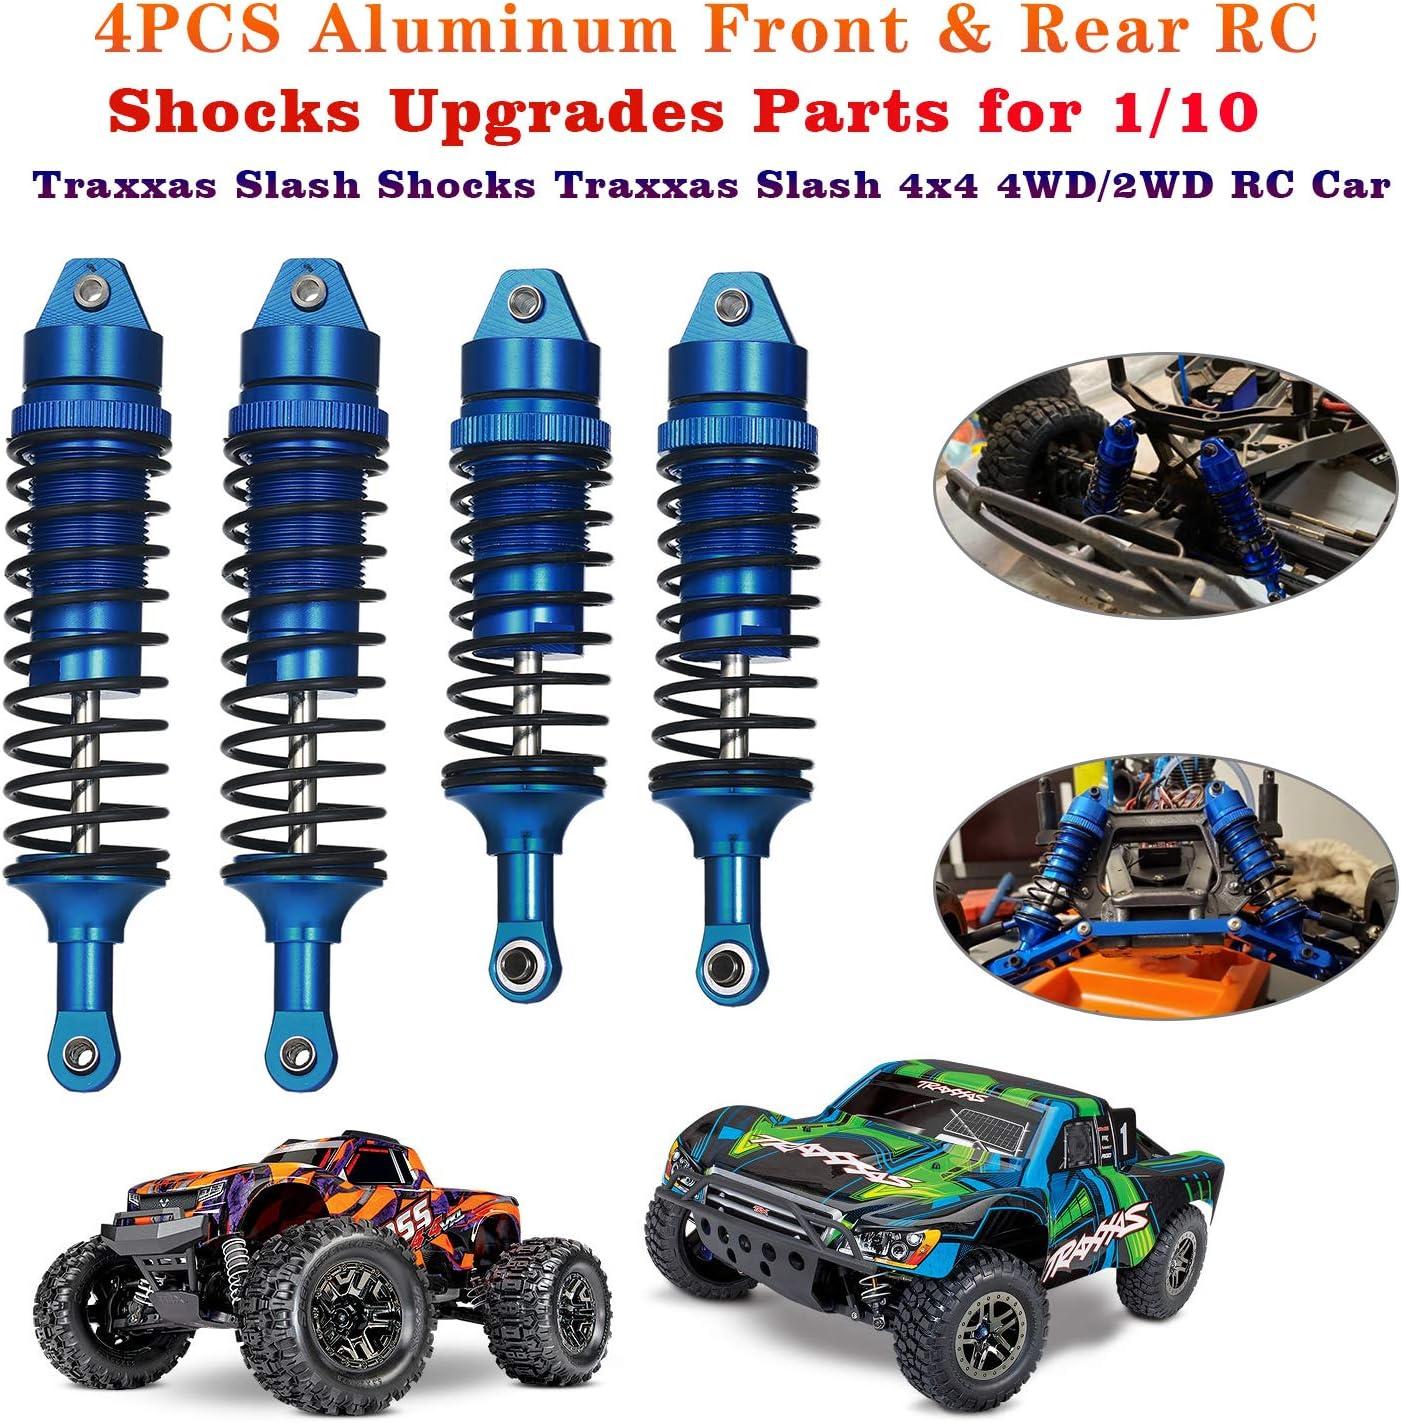 4PCS Aluminum Front /& Rear RC Shocks Absorber Assembled Full Metal Big Bore Shocks Upgrades Parts for 1//10 Traxxas Slash Shocks Traxxas Slash 4x4 4WD//2WD RC Car Replace 5862